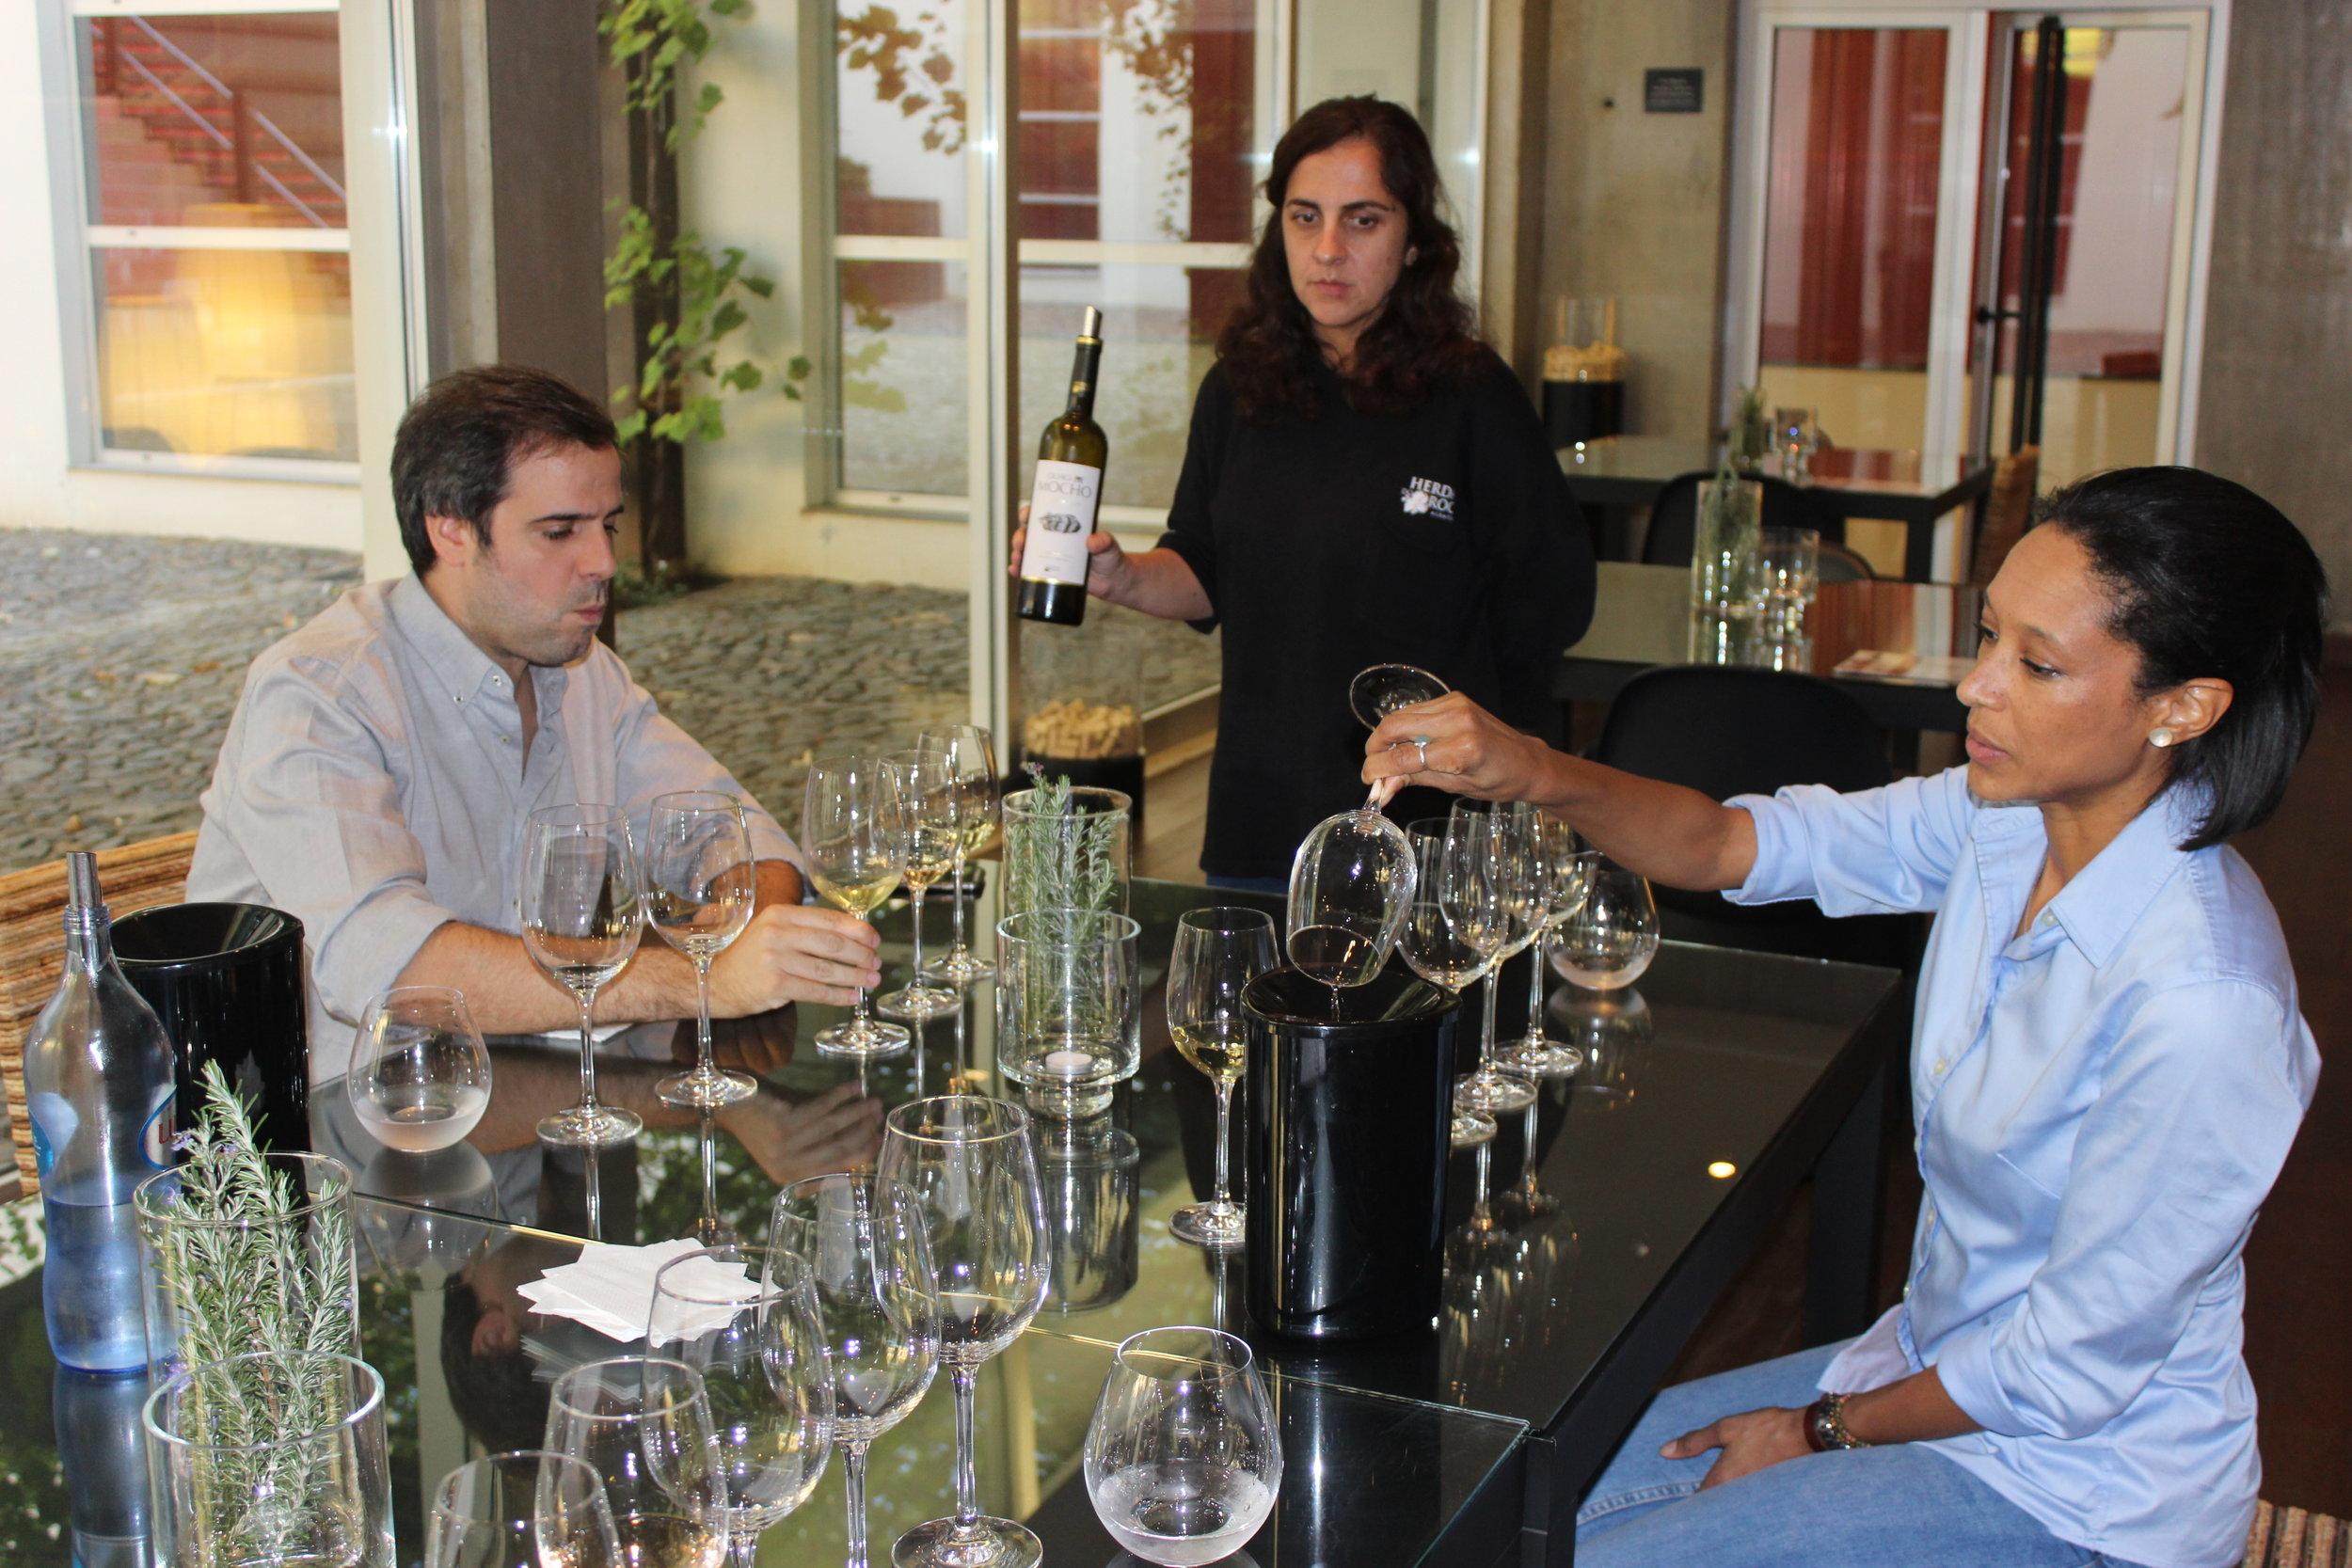 gen. manager & winemaker pedro ribeiro of herdade do rocim